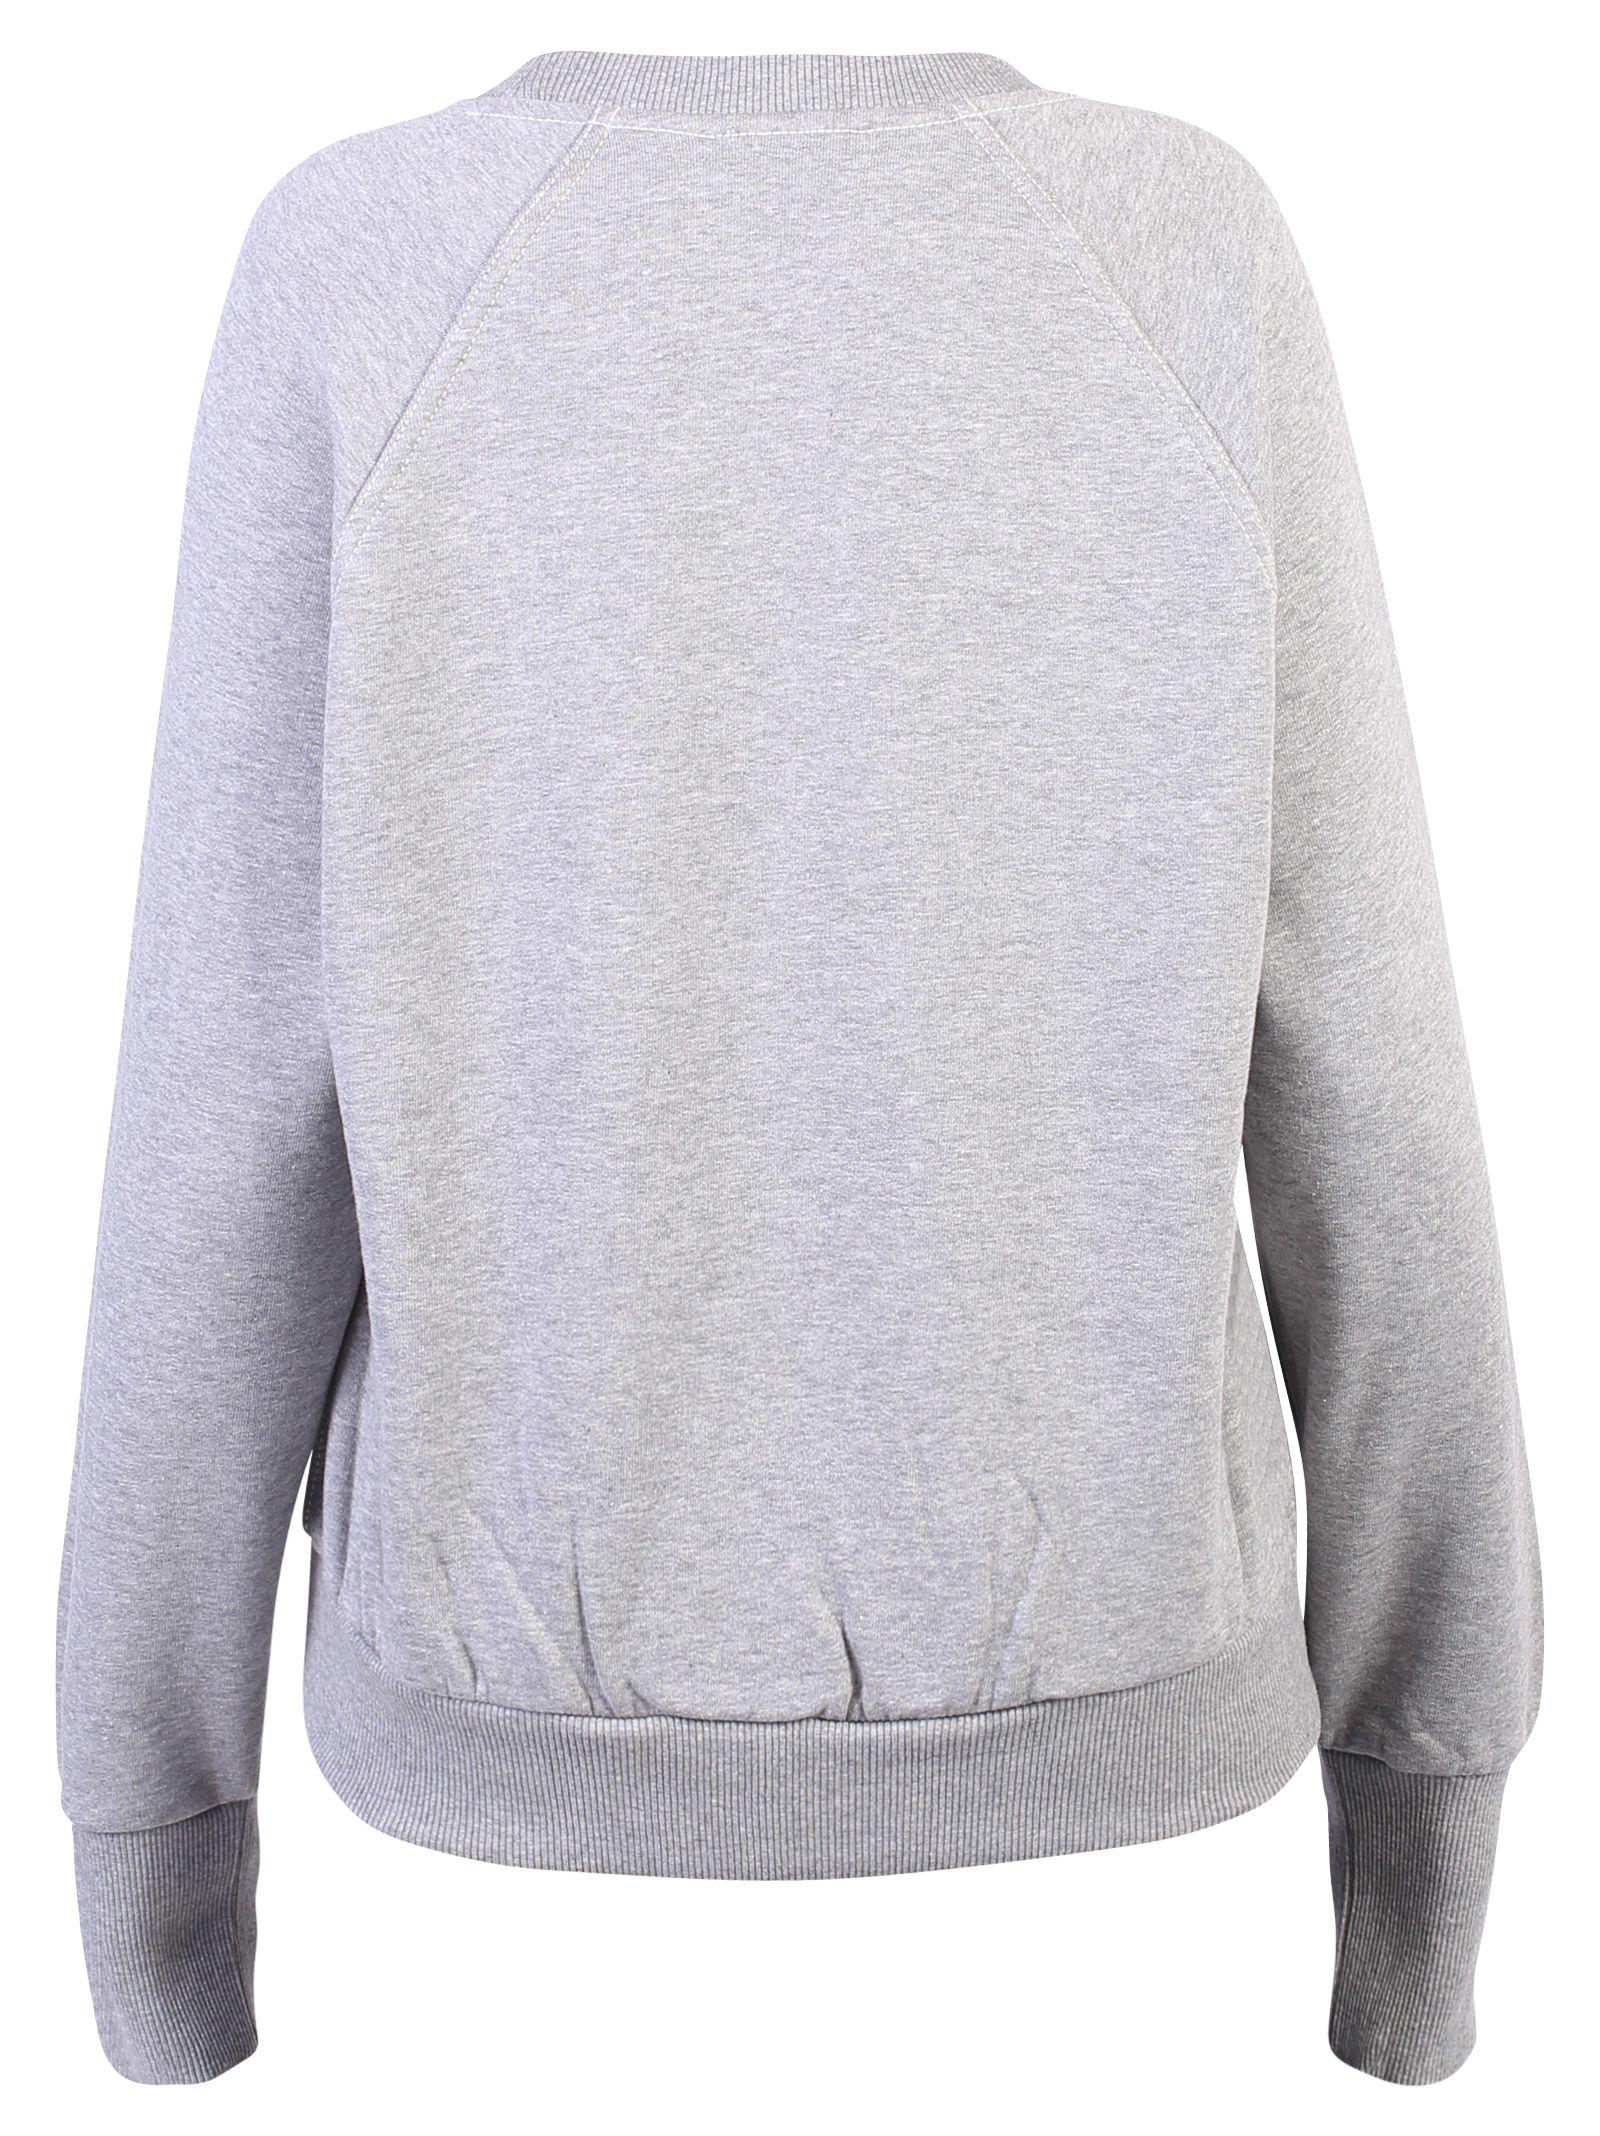 Burberry Embroidered Cotton Blend Sweatshirt